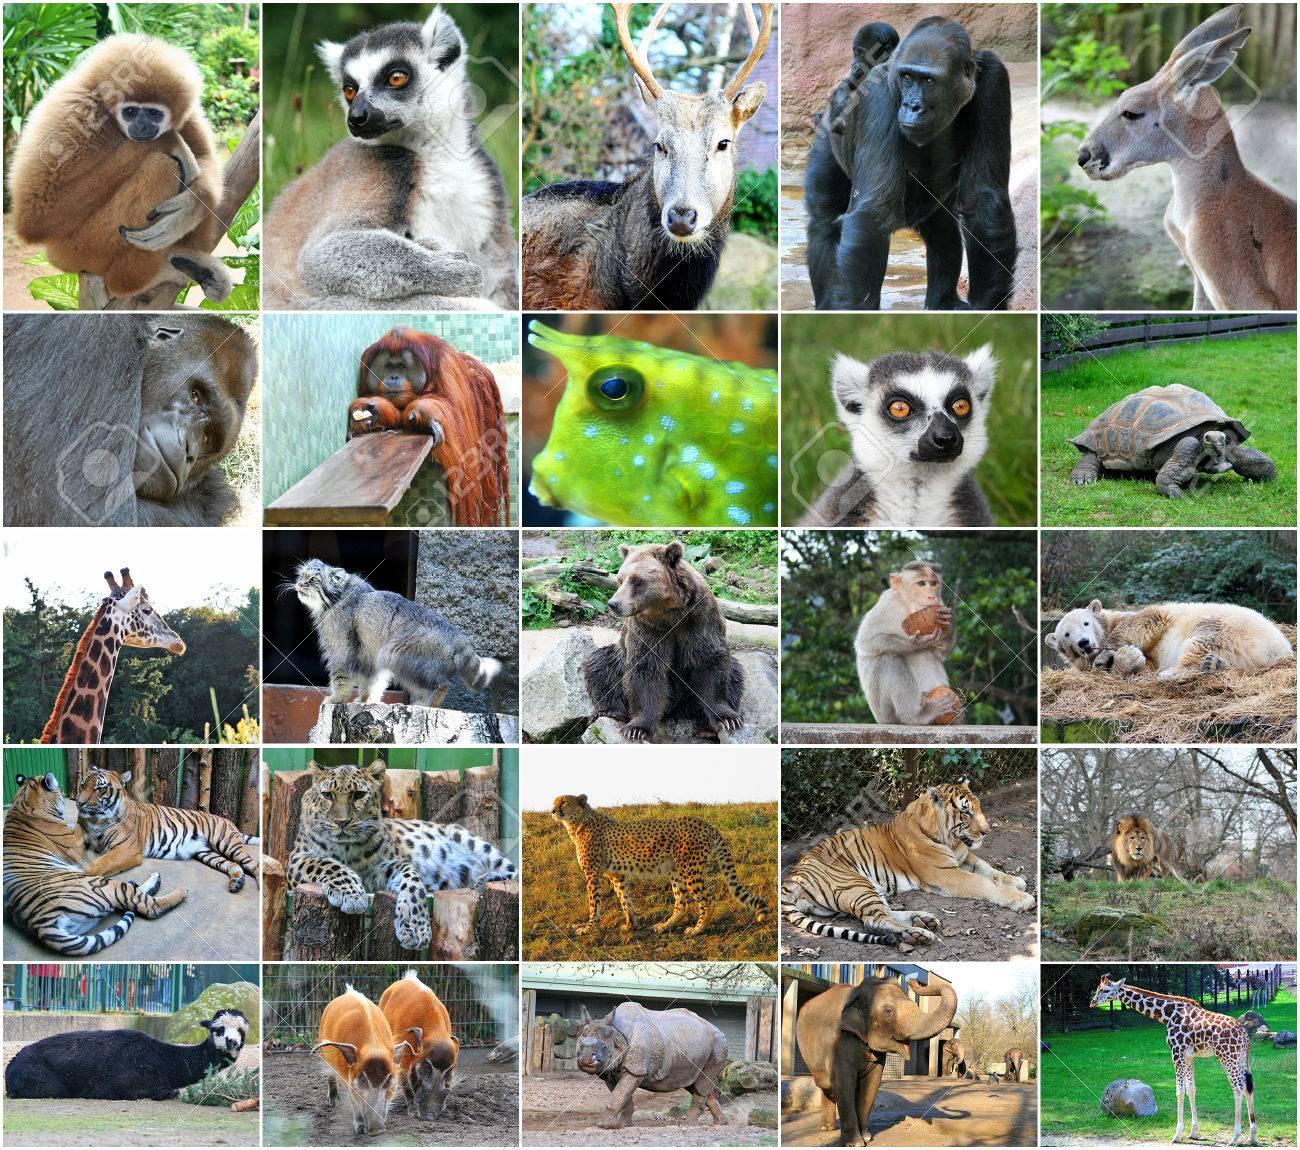 Collage Photos Of Some Wild Animals Stock Photo